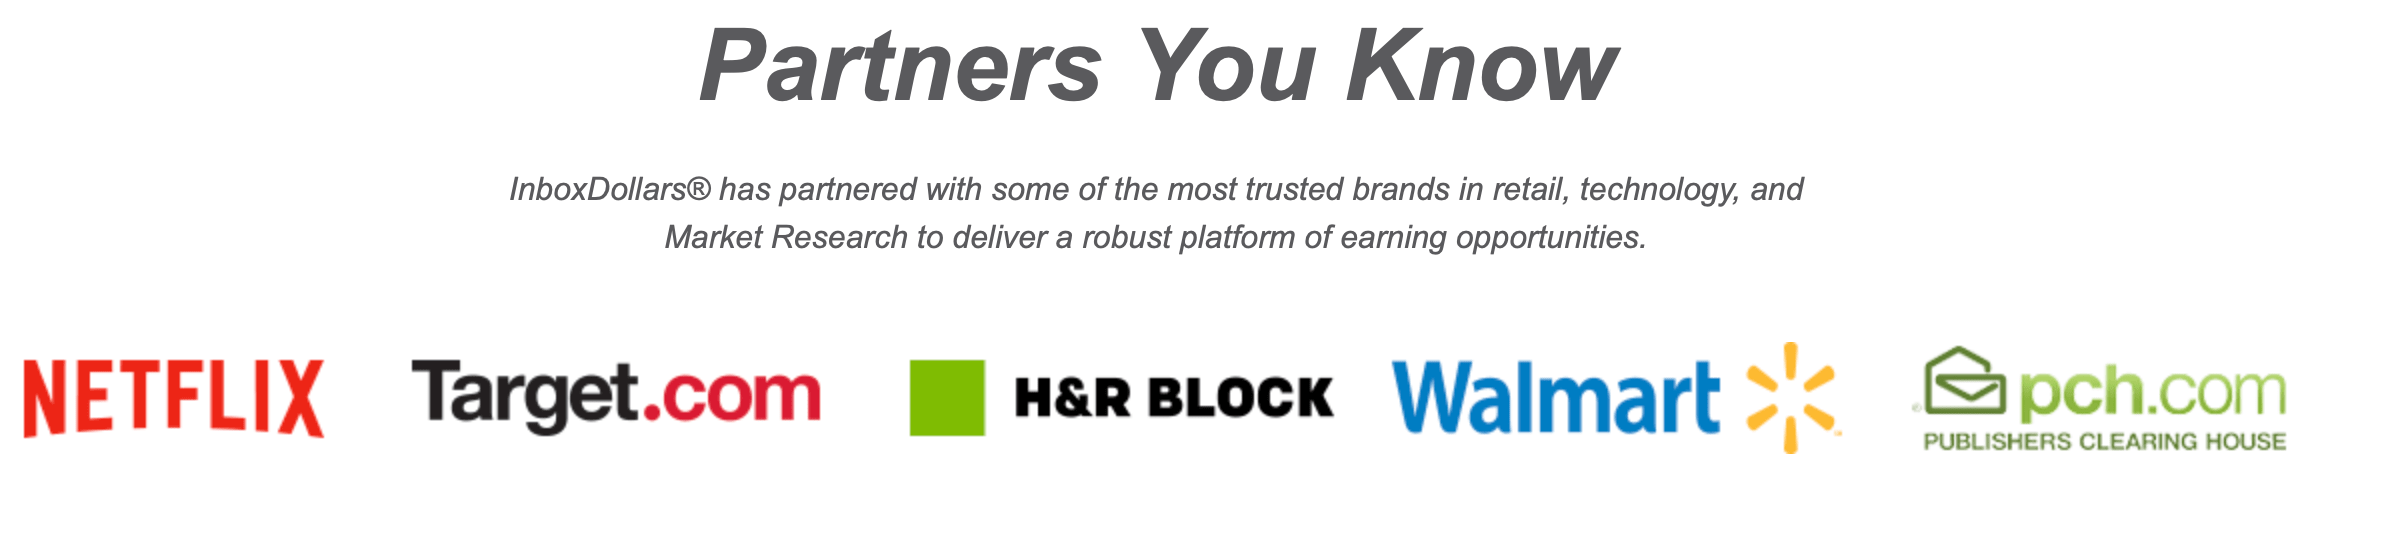 InboxDollars partners